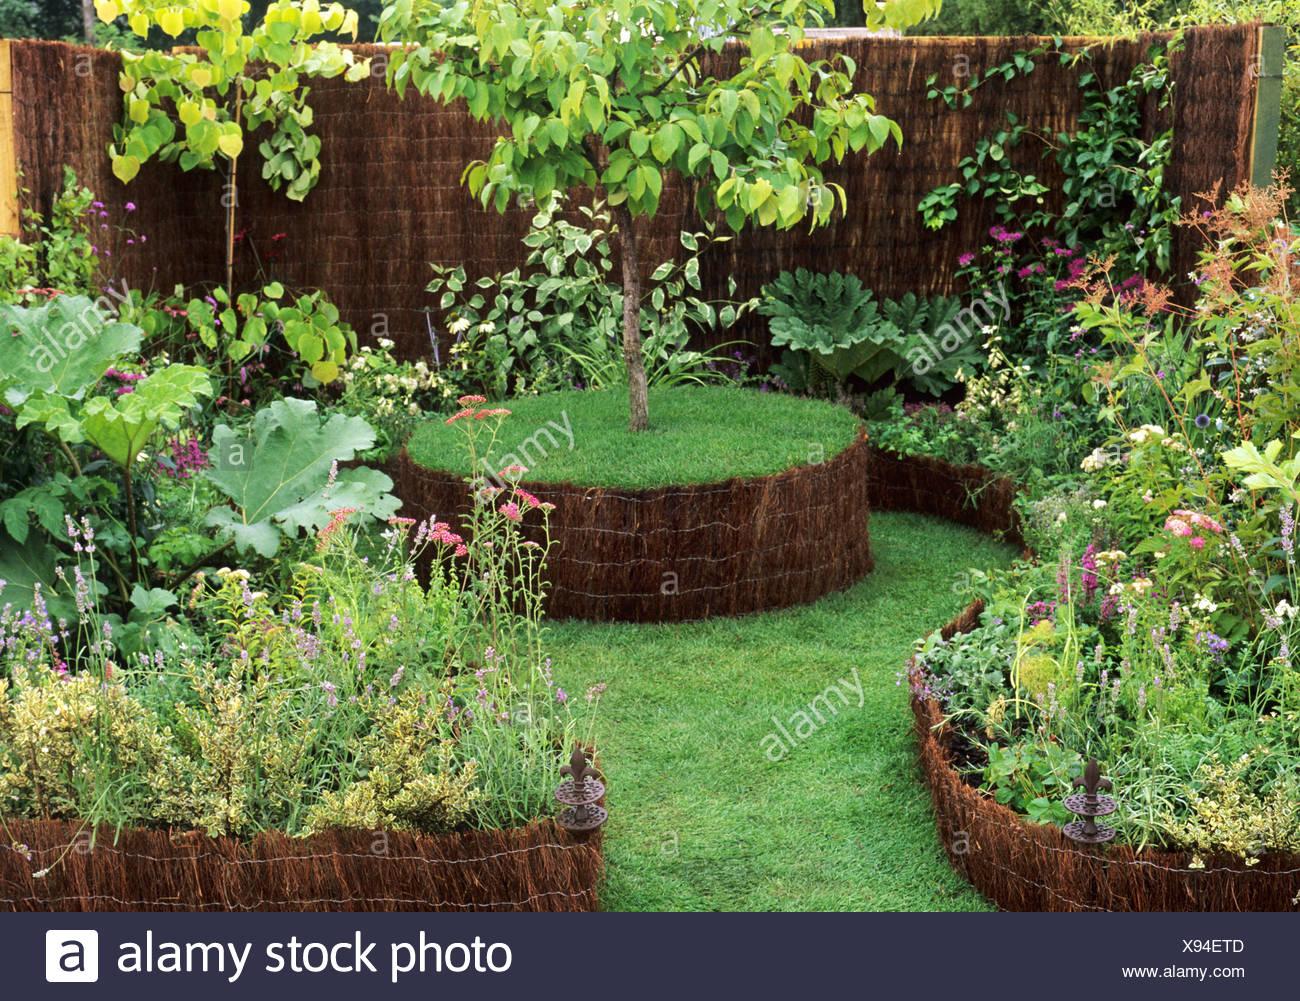 Medieval Style Garden, Sandringham Flower Show, New Shoots Garden Design,  Herbal, Medicinal Plants Planting Small Gardens Plant